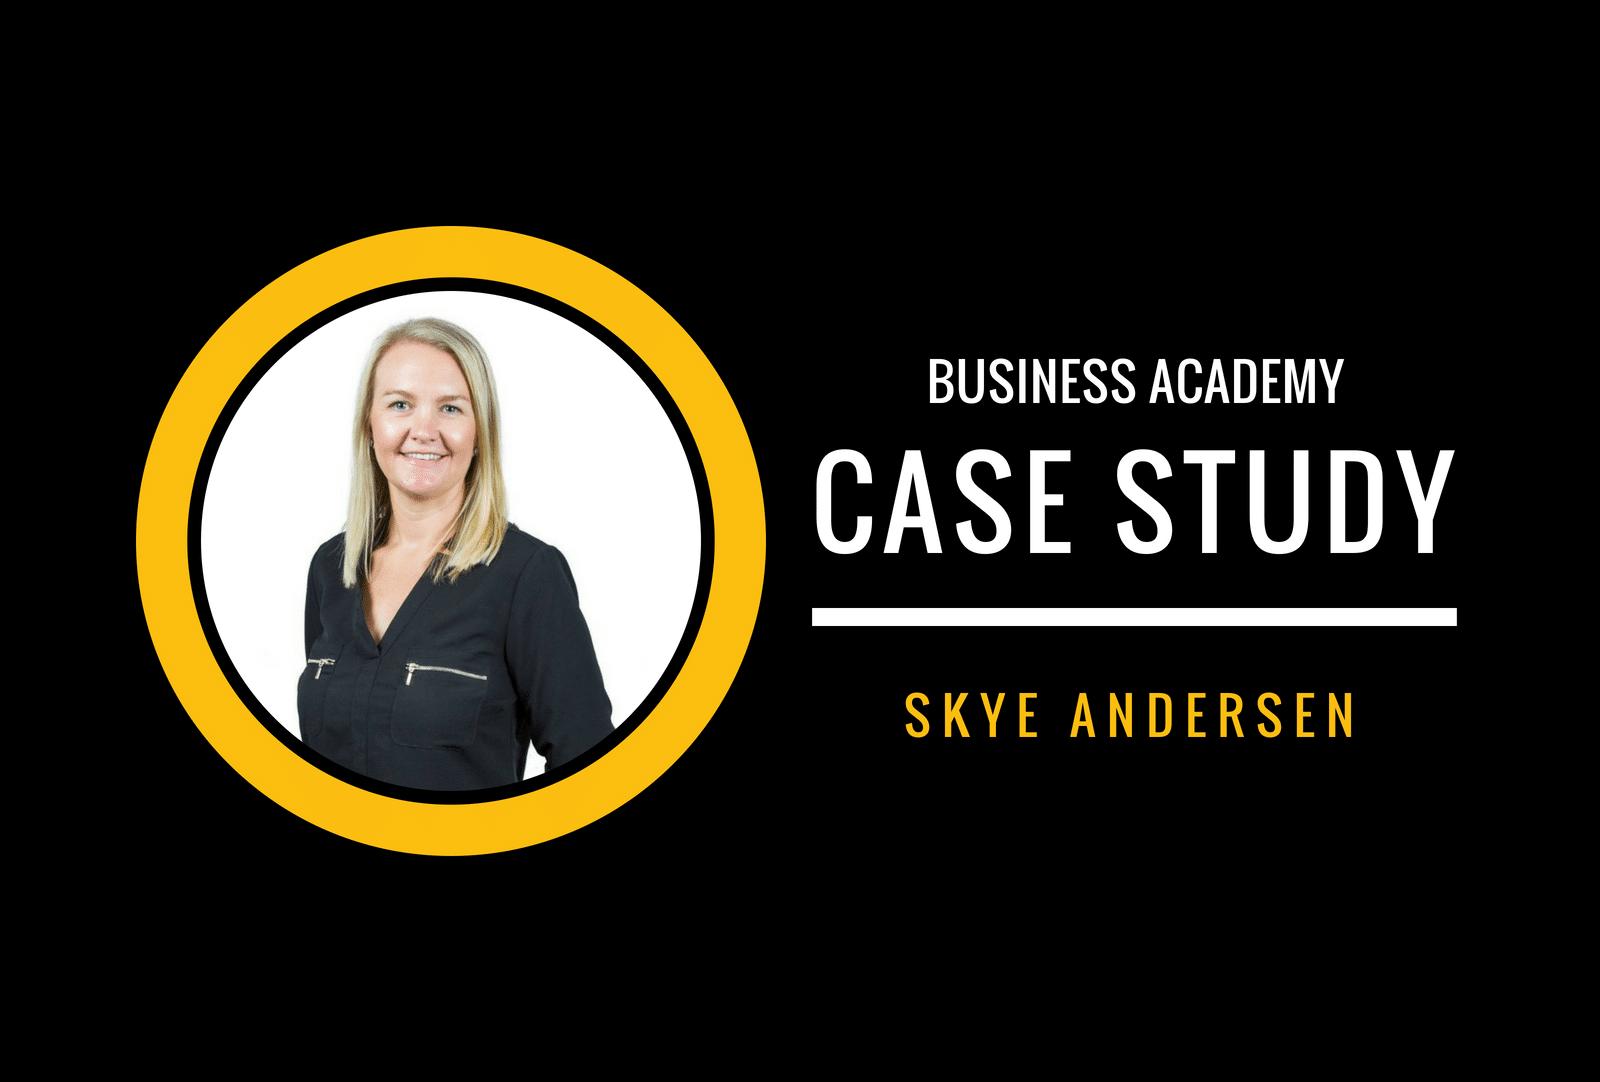 Skye Andersen